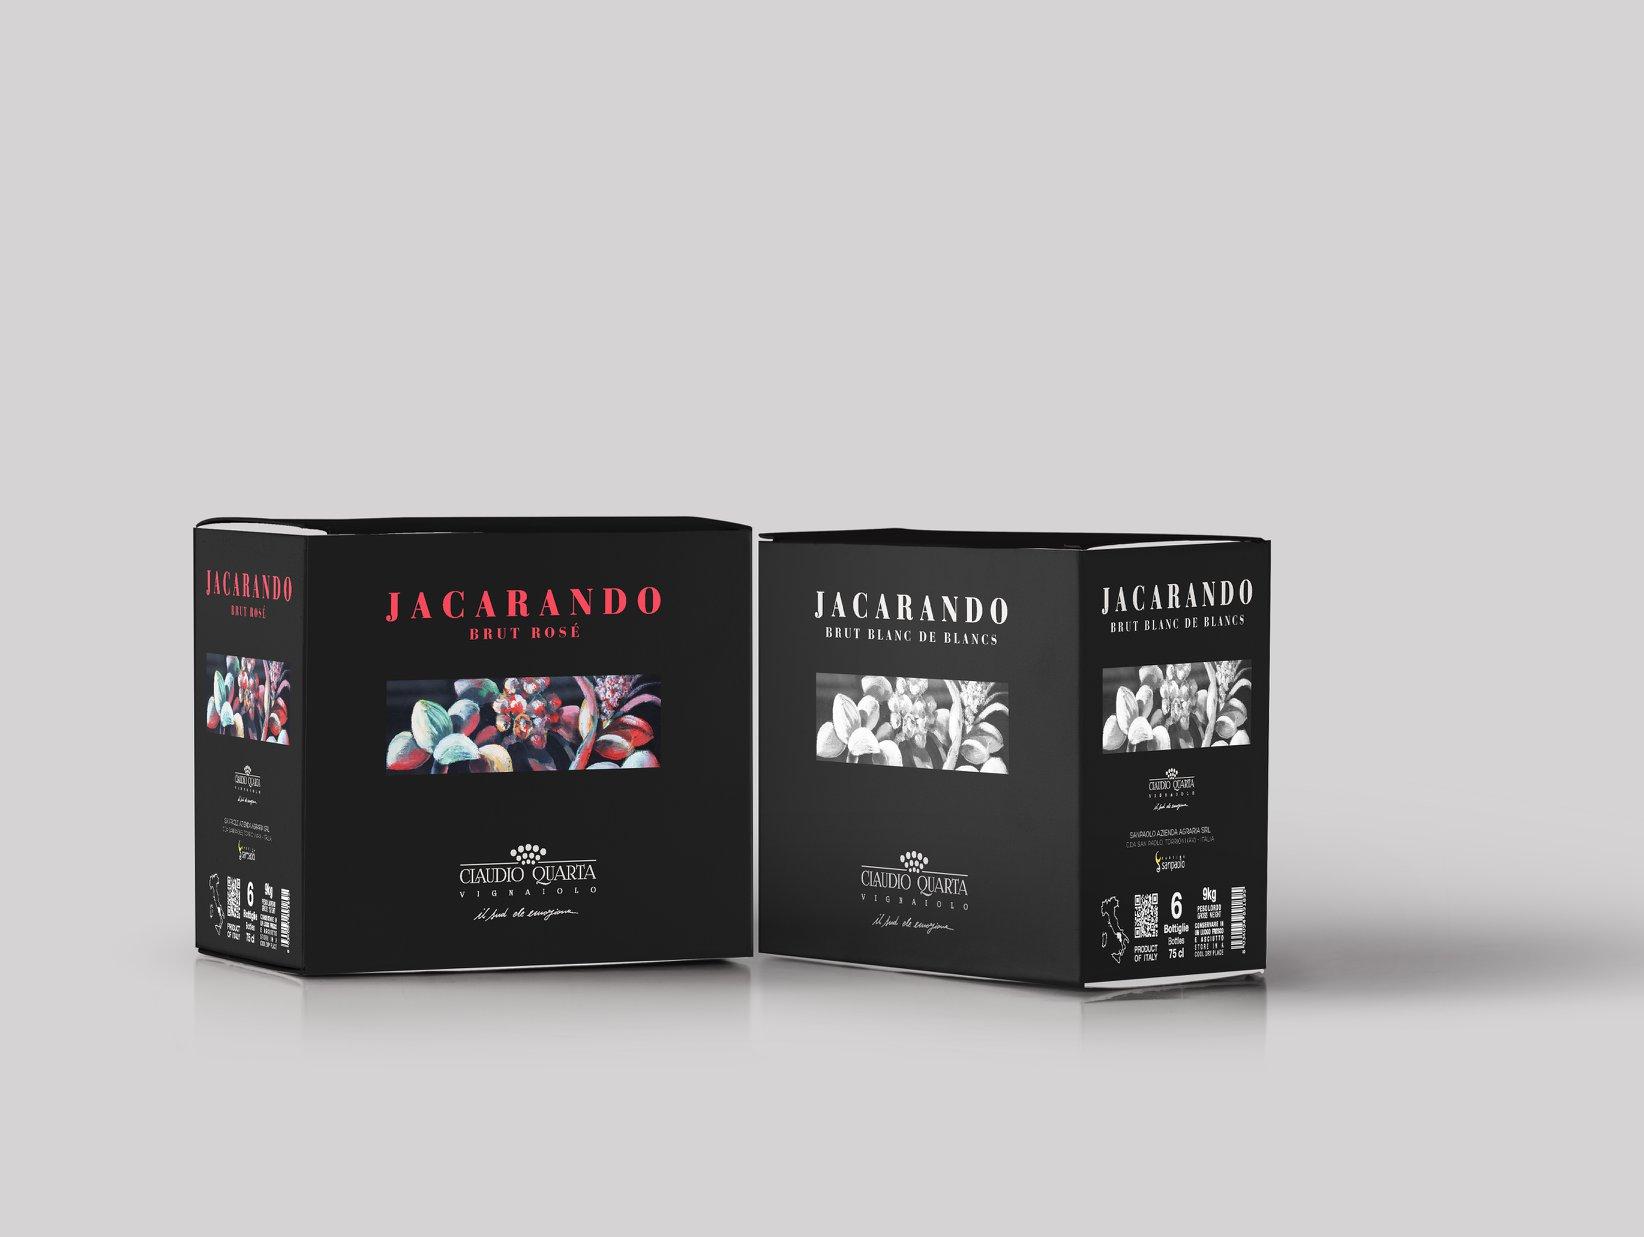 jacarando-cartone-label